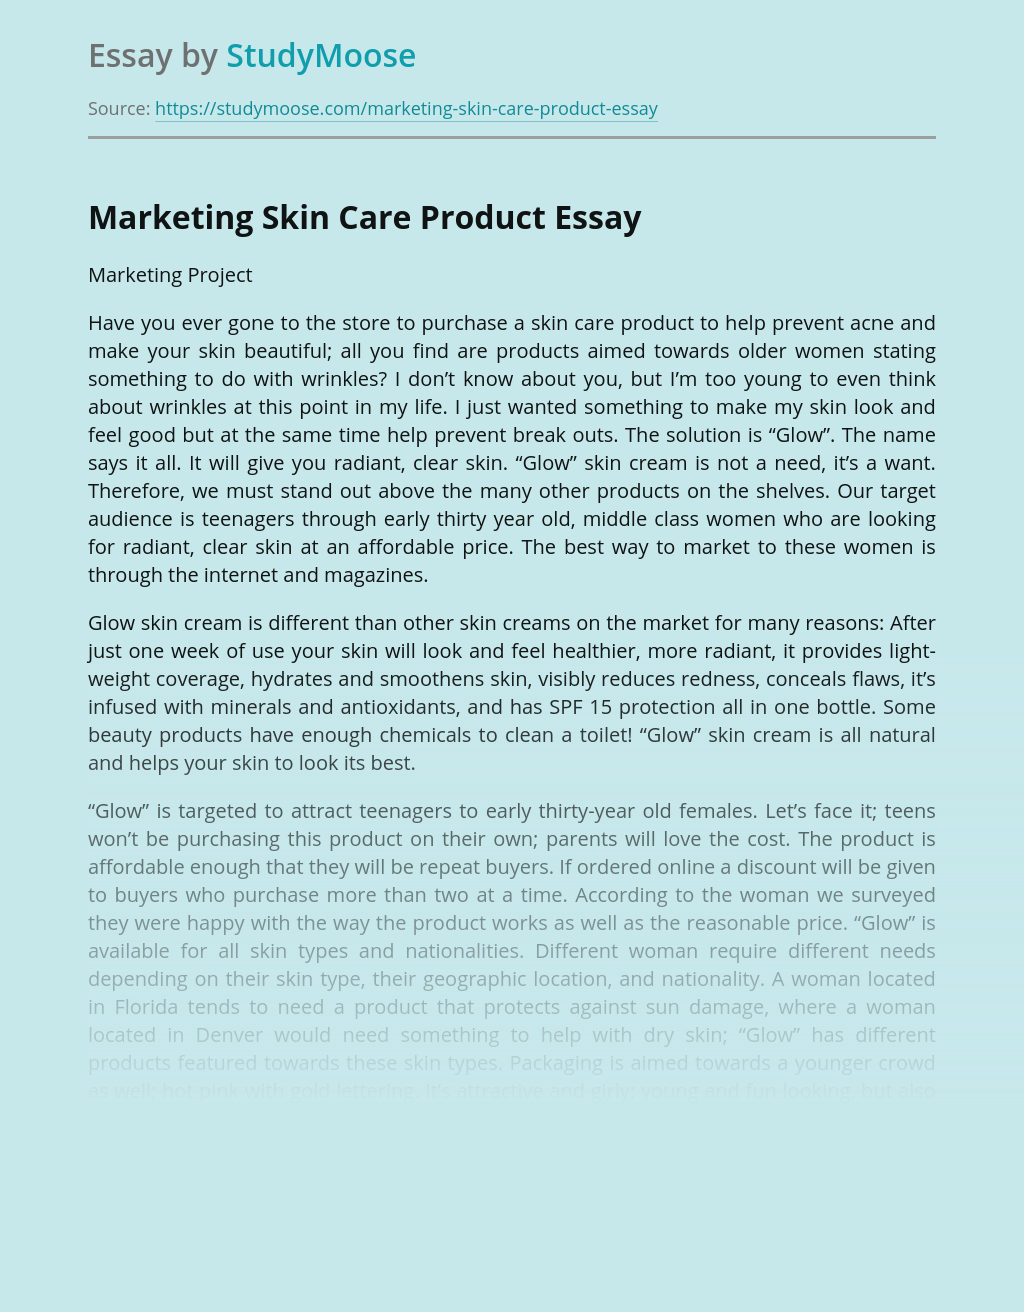 Marketing Skin Care Product